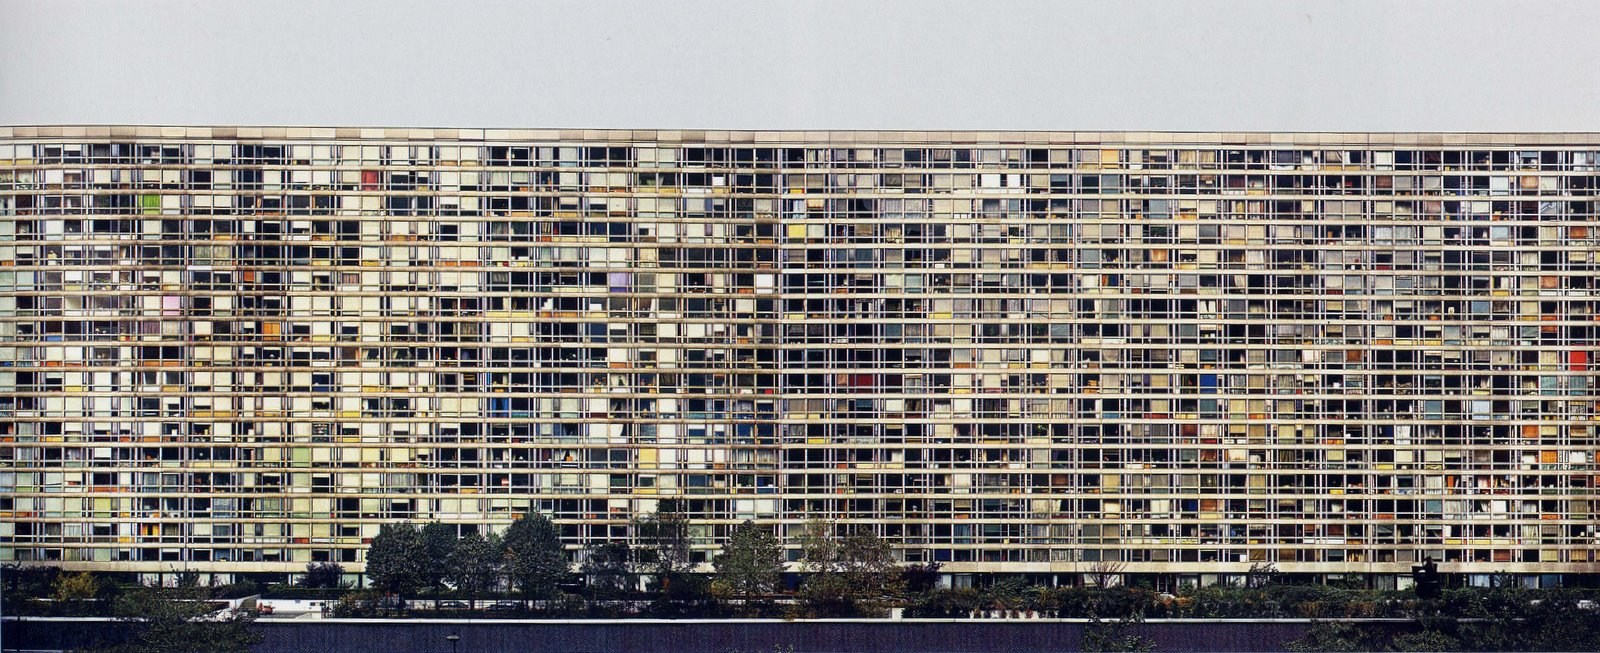 Andreas Gursky , Paris Montparnasse, 1993.